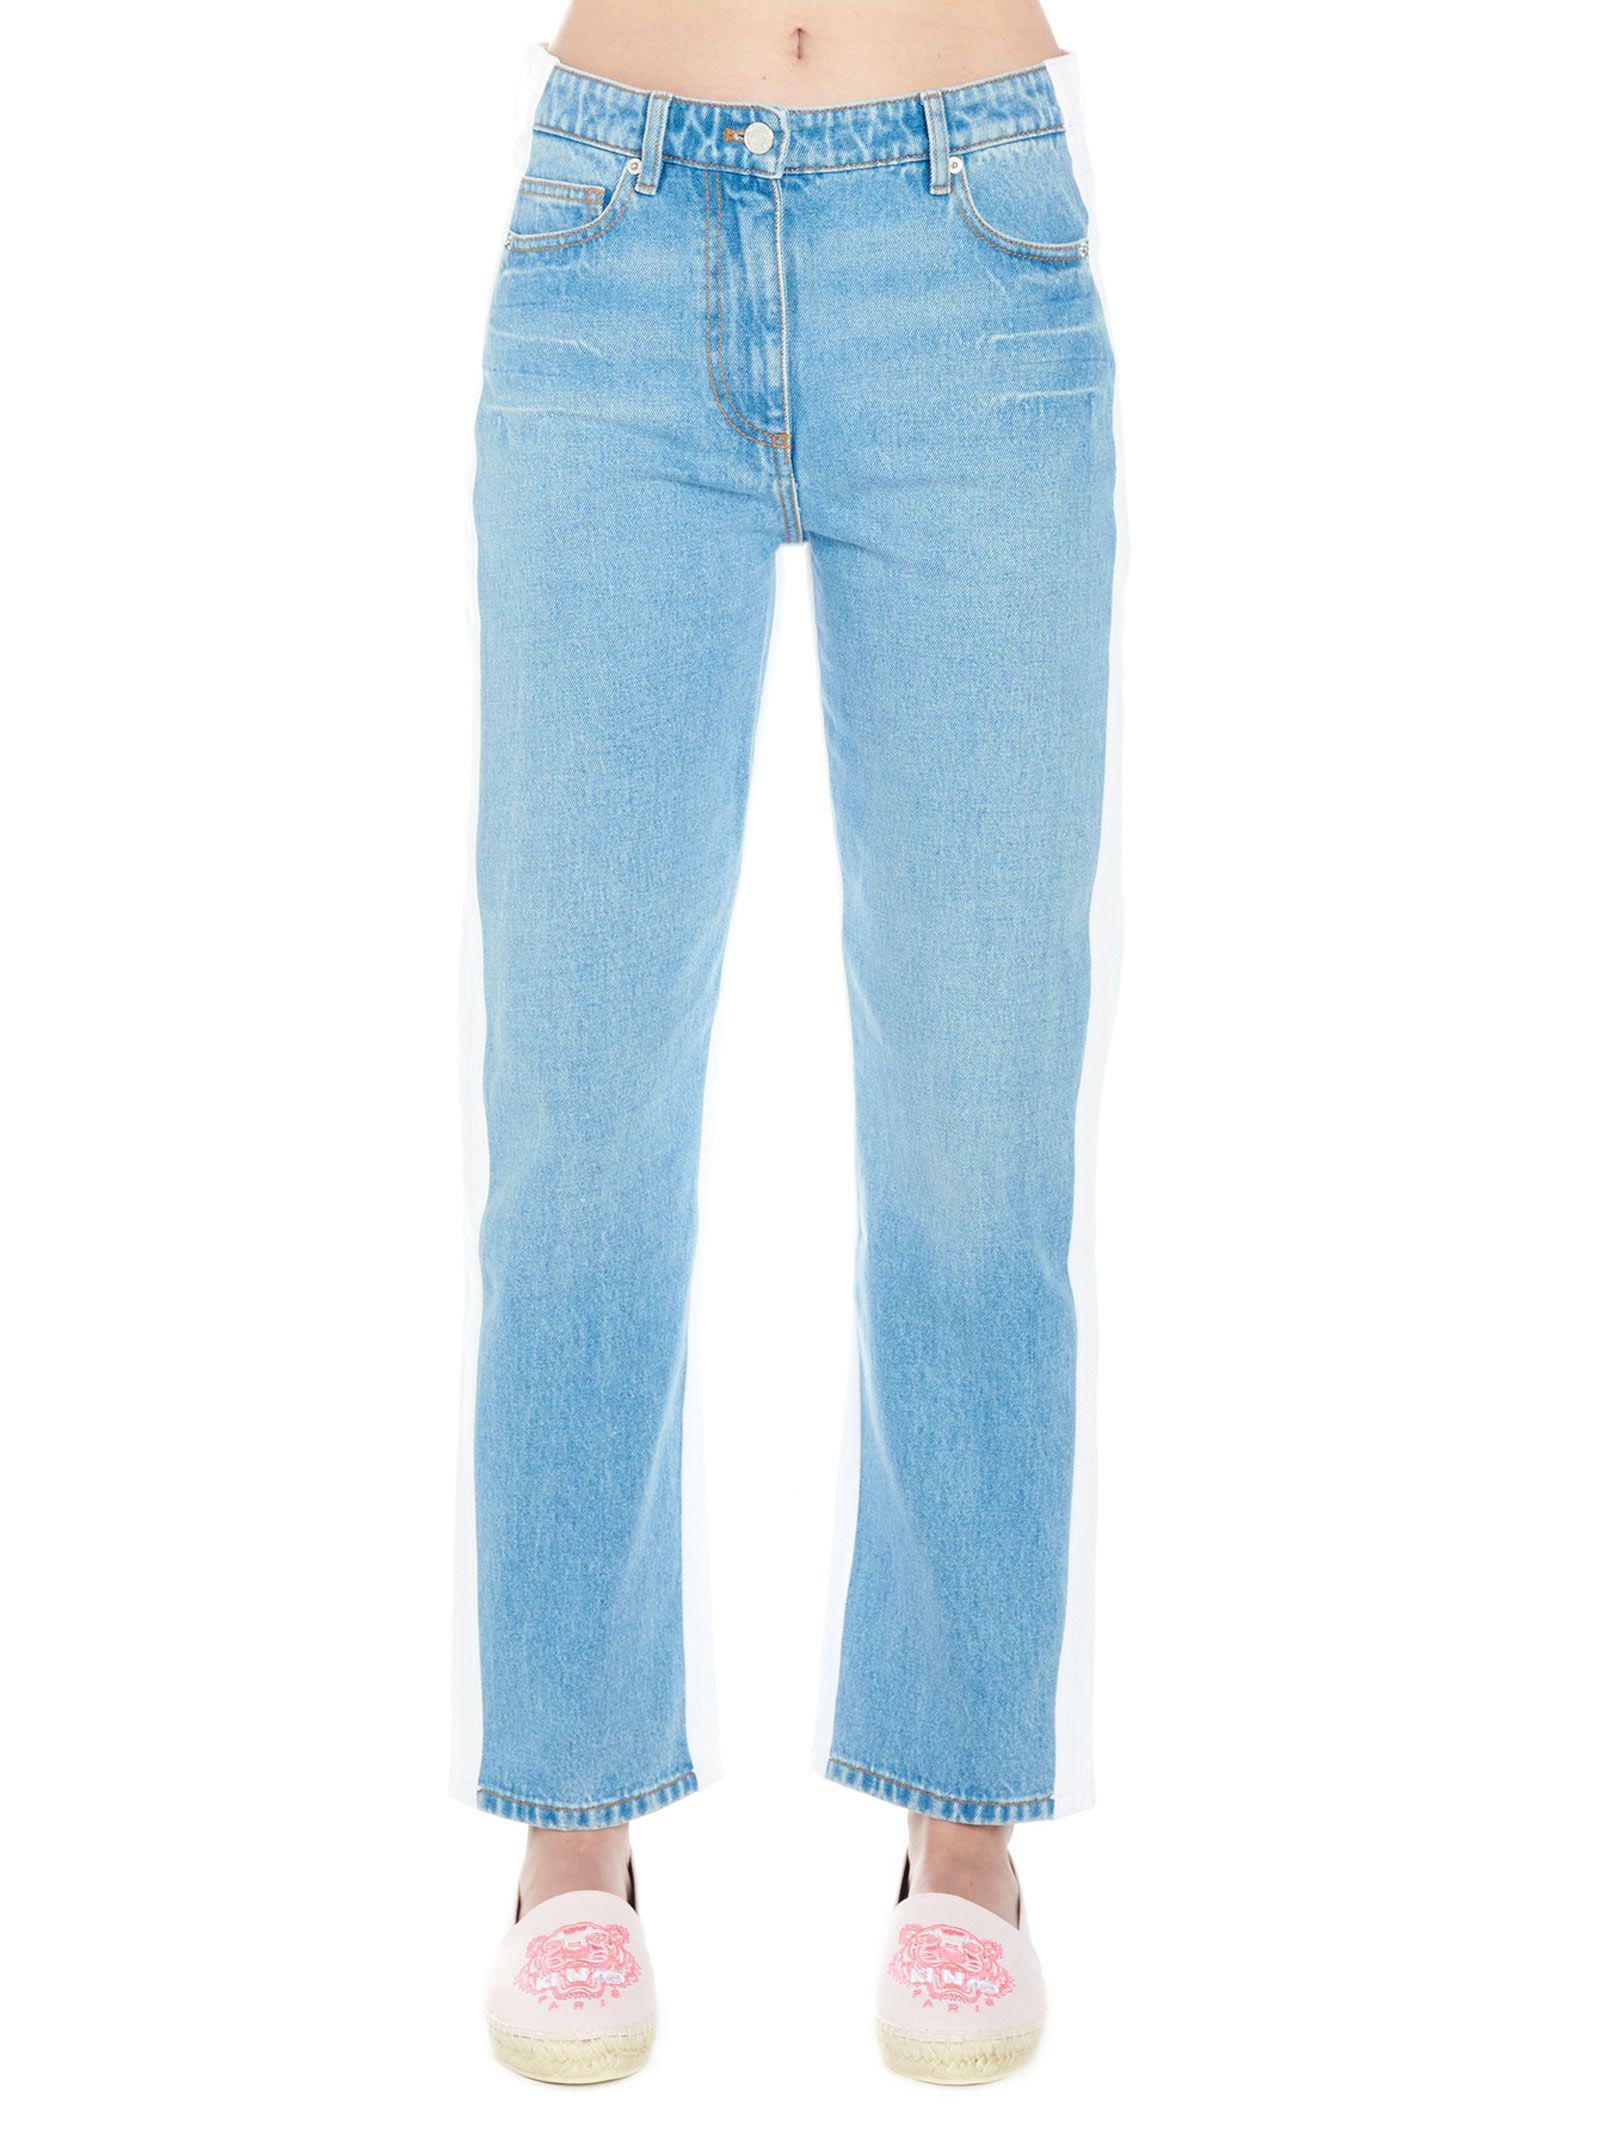 27b51522c Jeans in Blue